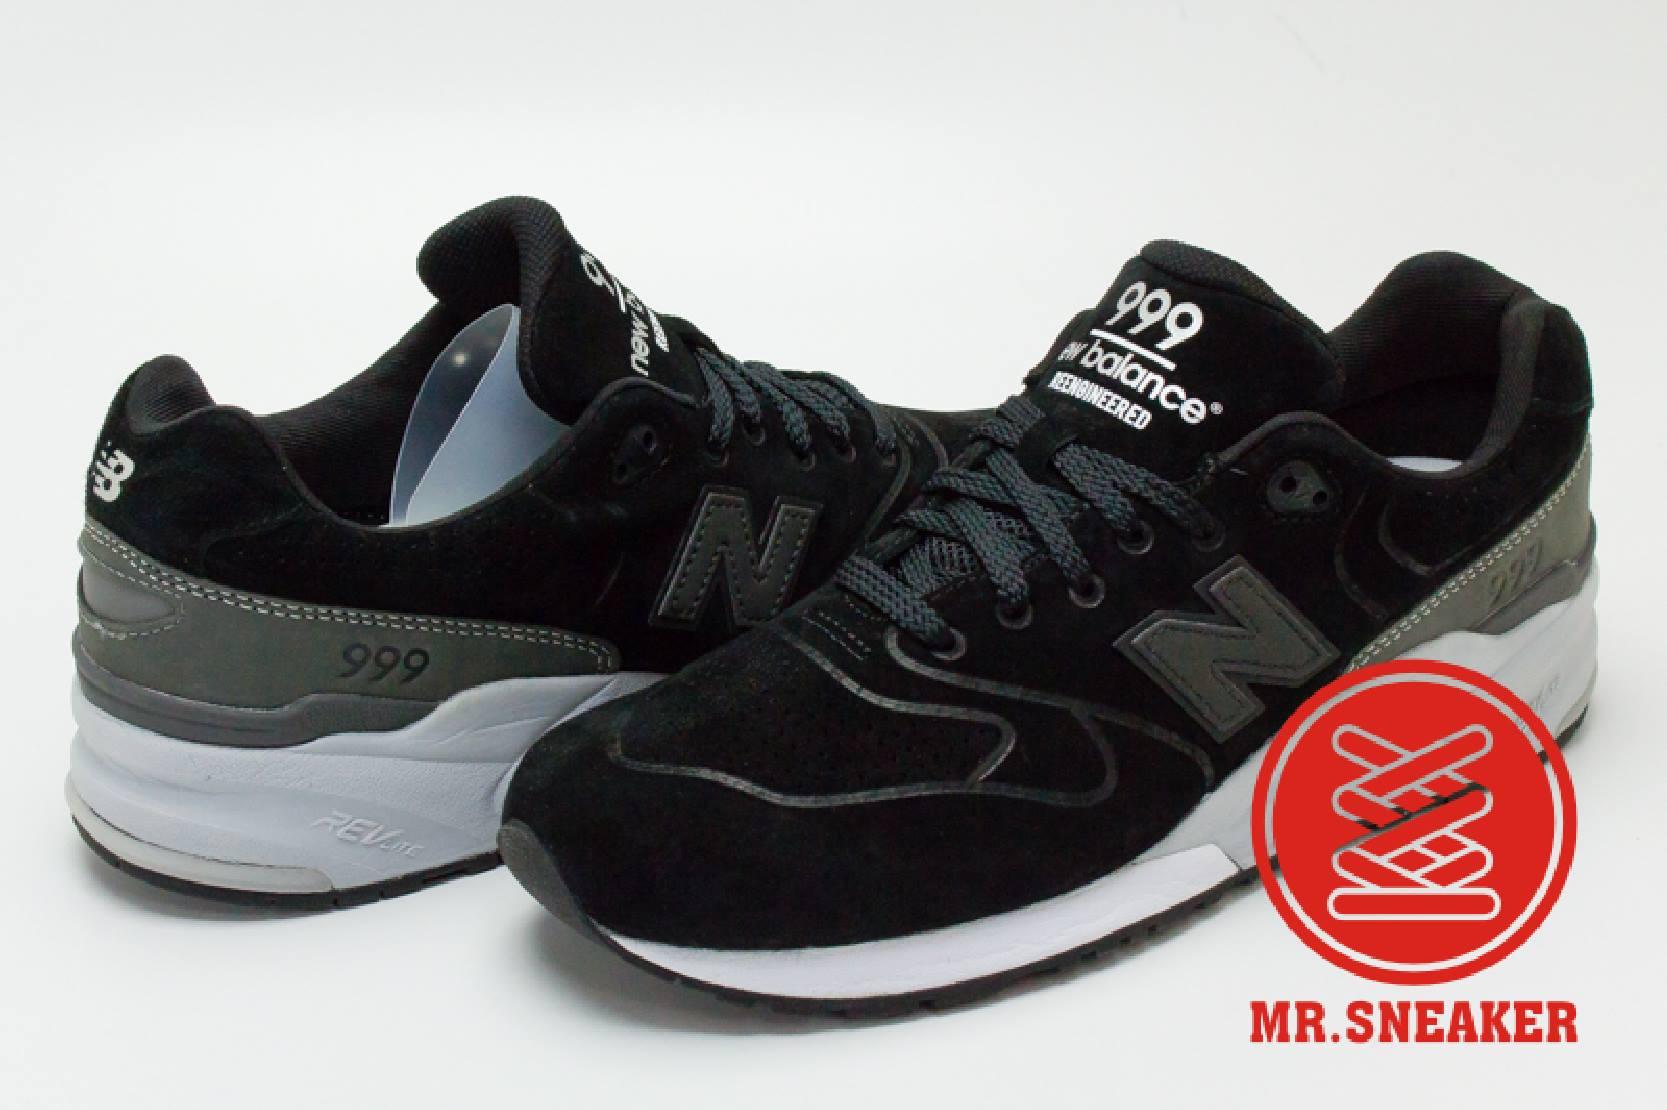 new arrival a6463 320ff 樂天購物網☆Mr.Sneaker☆NEW BALANCE MRL999BA 復古麂皮輕量中 ...